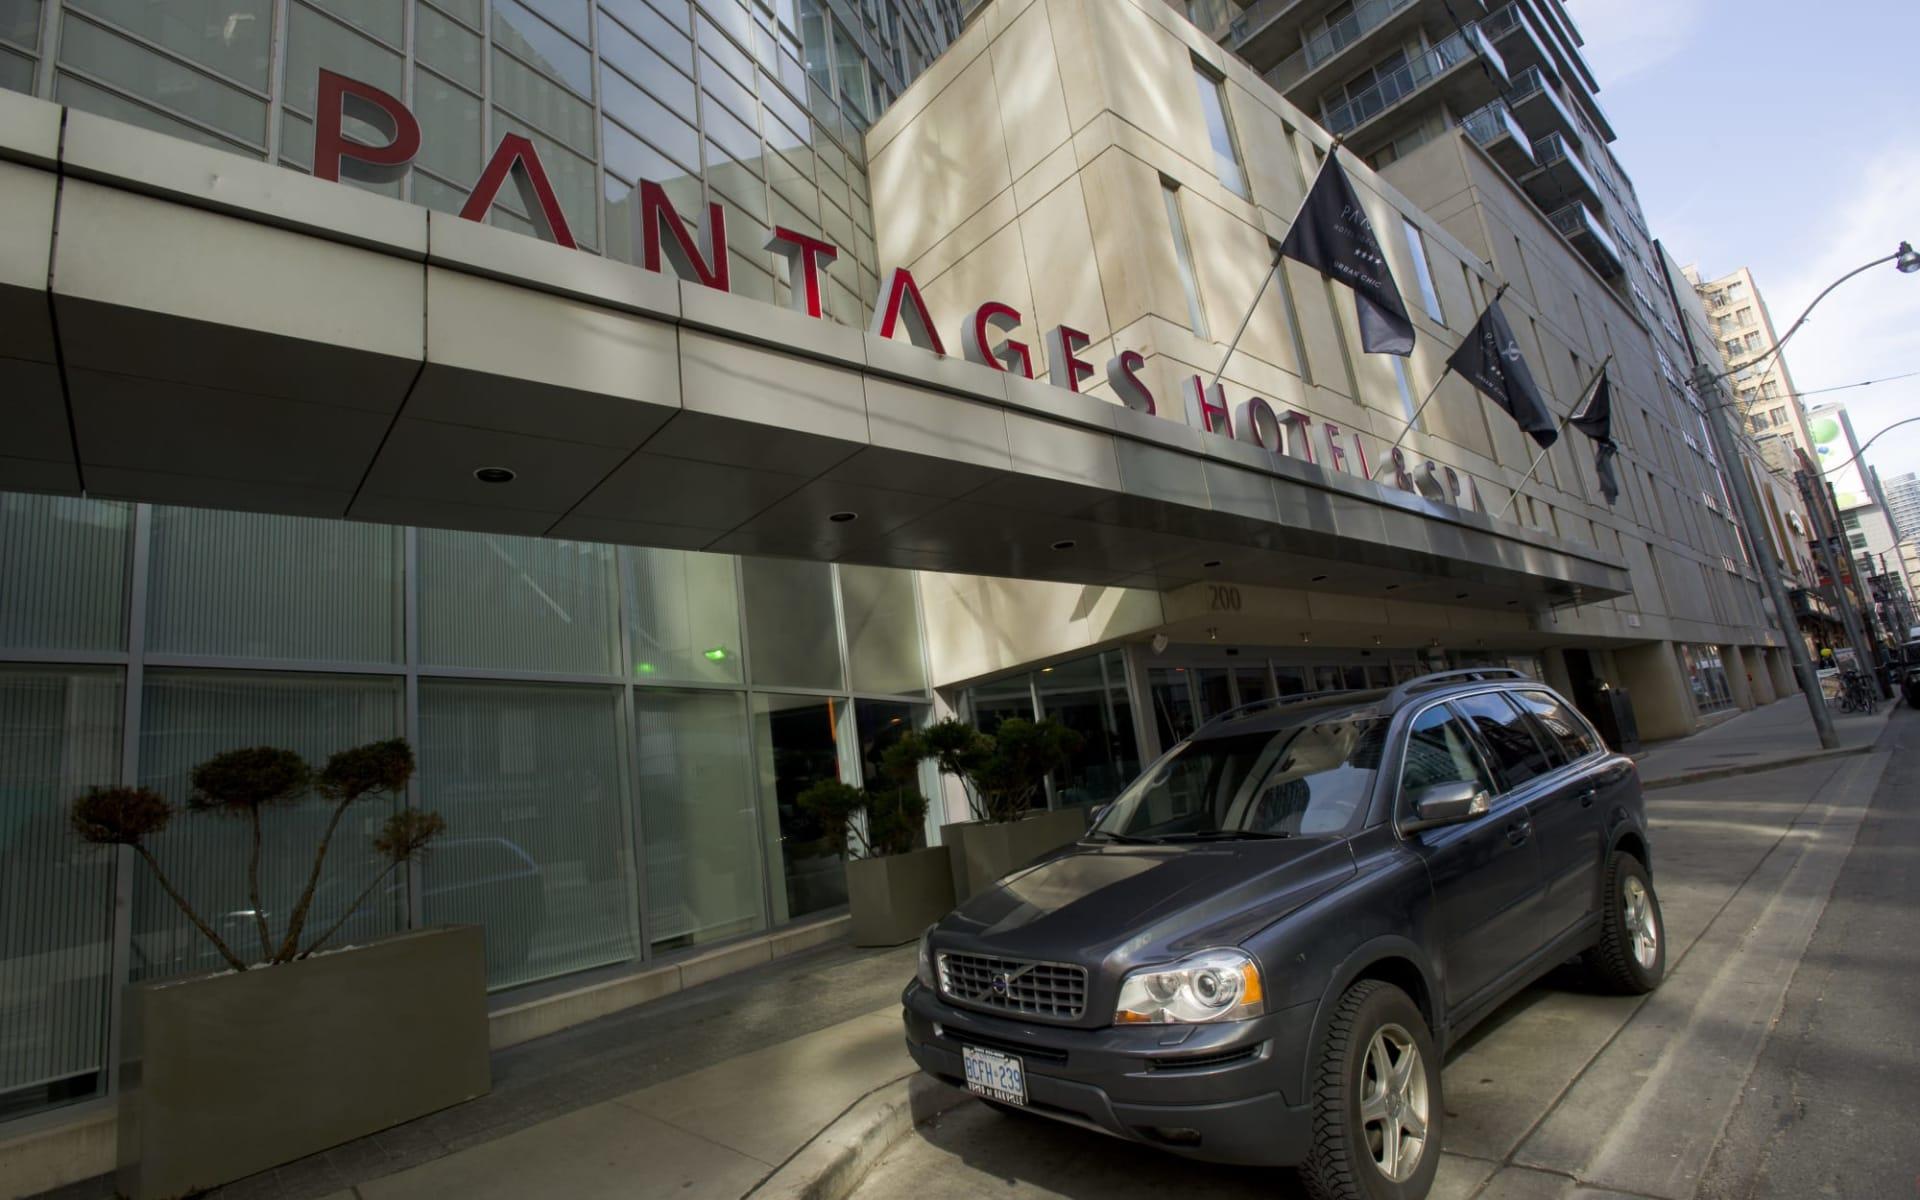 Pantages Hotel & Spa in Toronto:  Pantages Hotel & Spa_EntranceArea